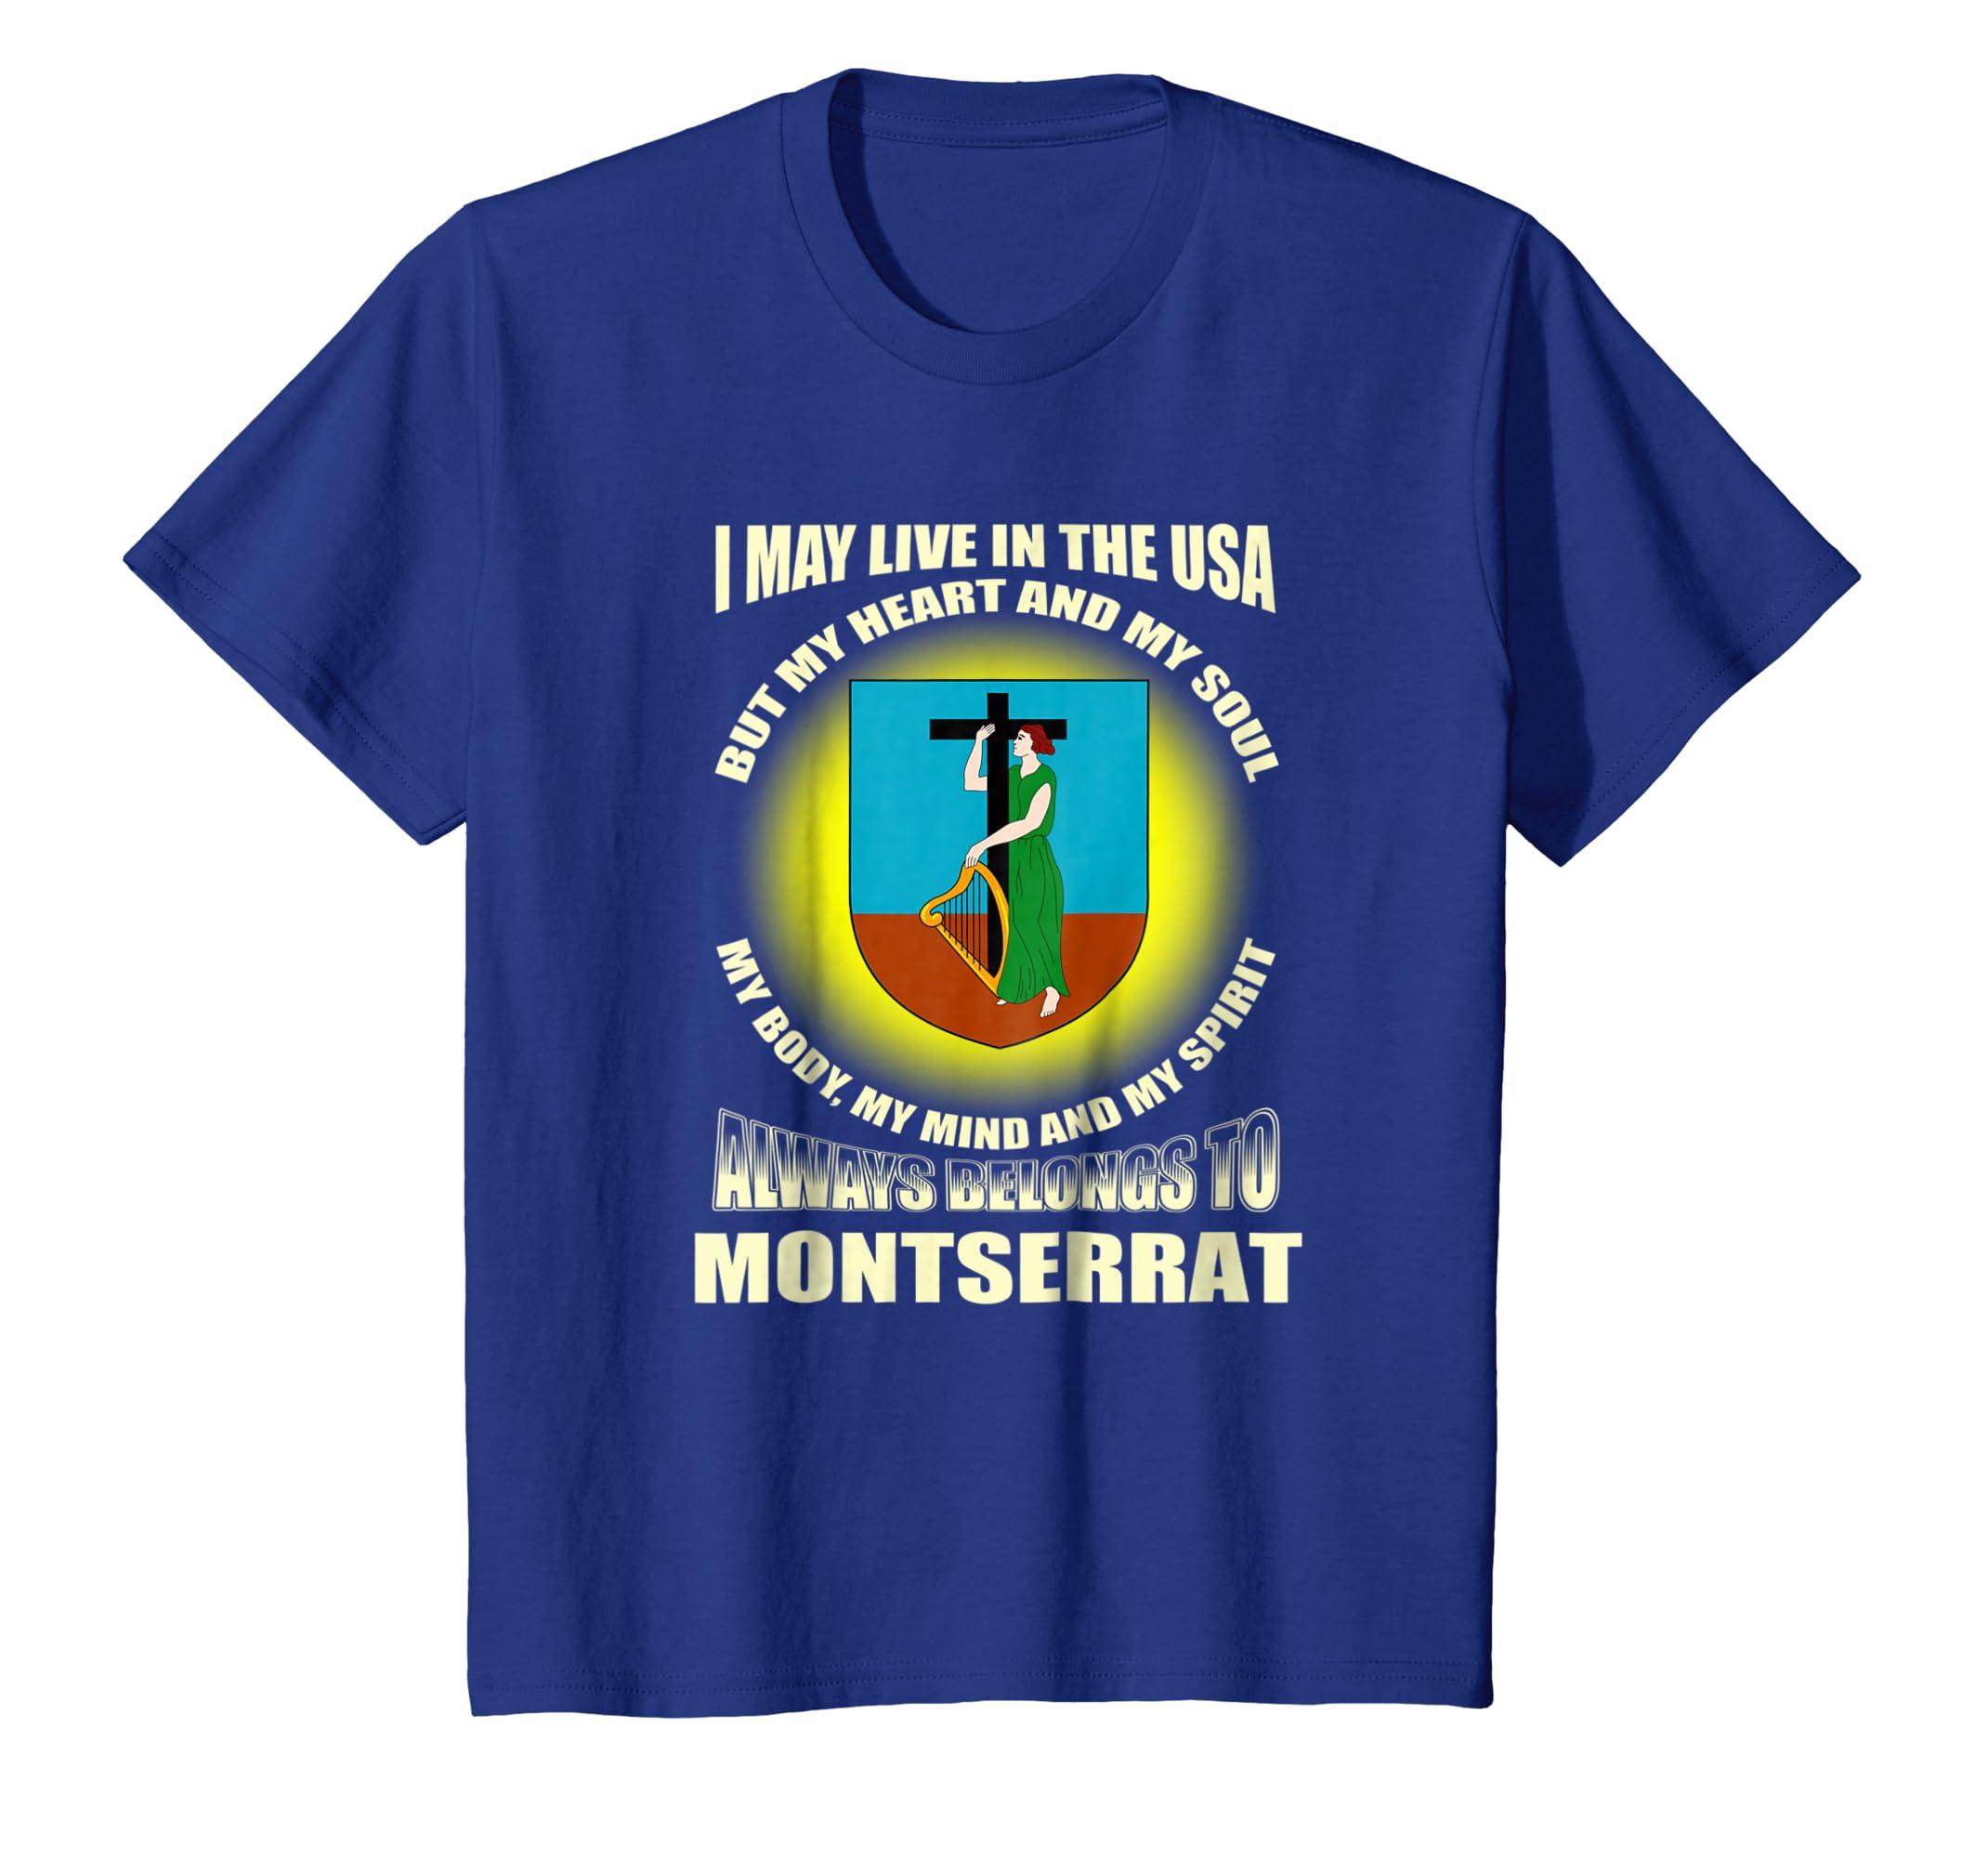 spirit of montserrat live